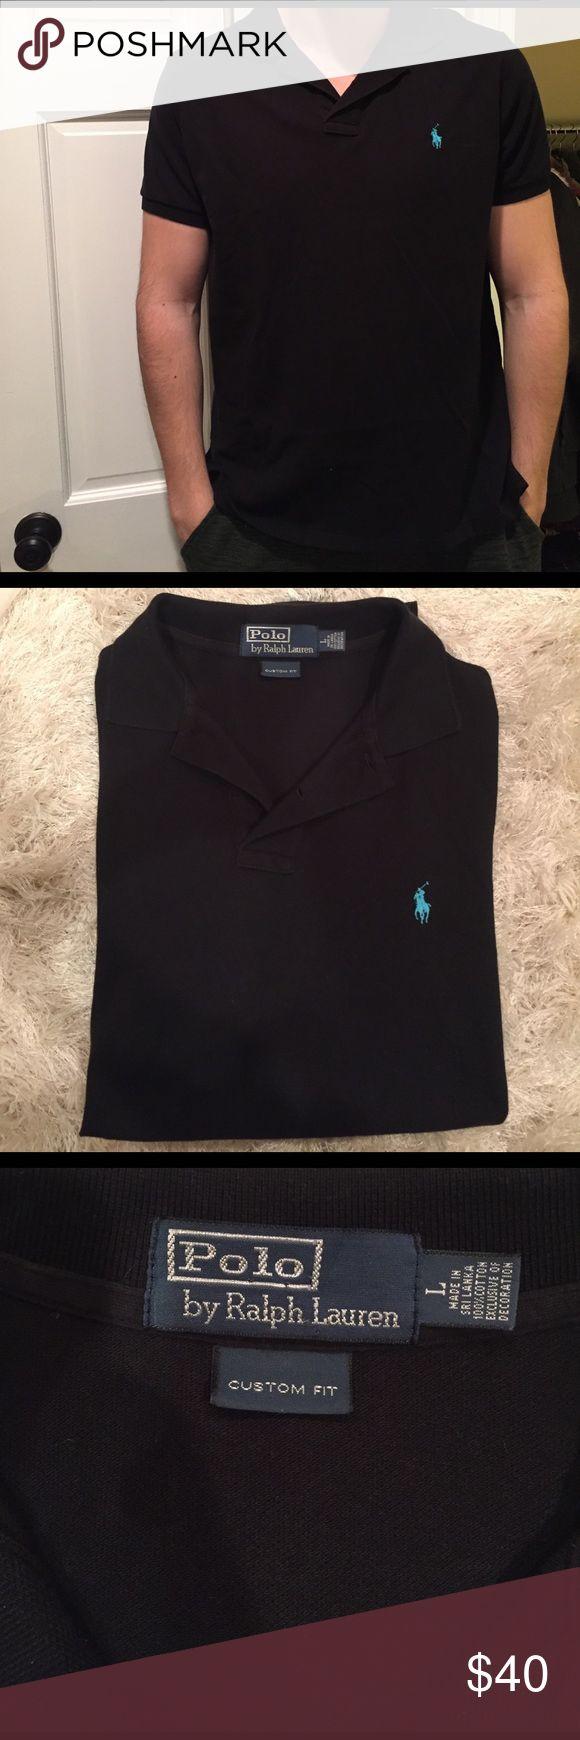 Polo by Ralph Lauren black polo shirt Polo Ralph Lauren Custom Fit black polo. Size Large. Barely worn Polo by Ralph Lauren Shirts